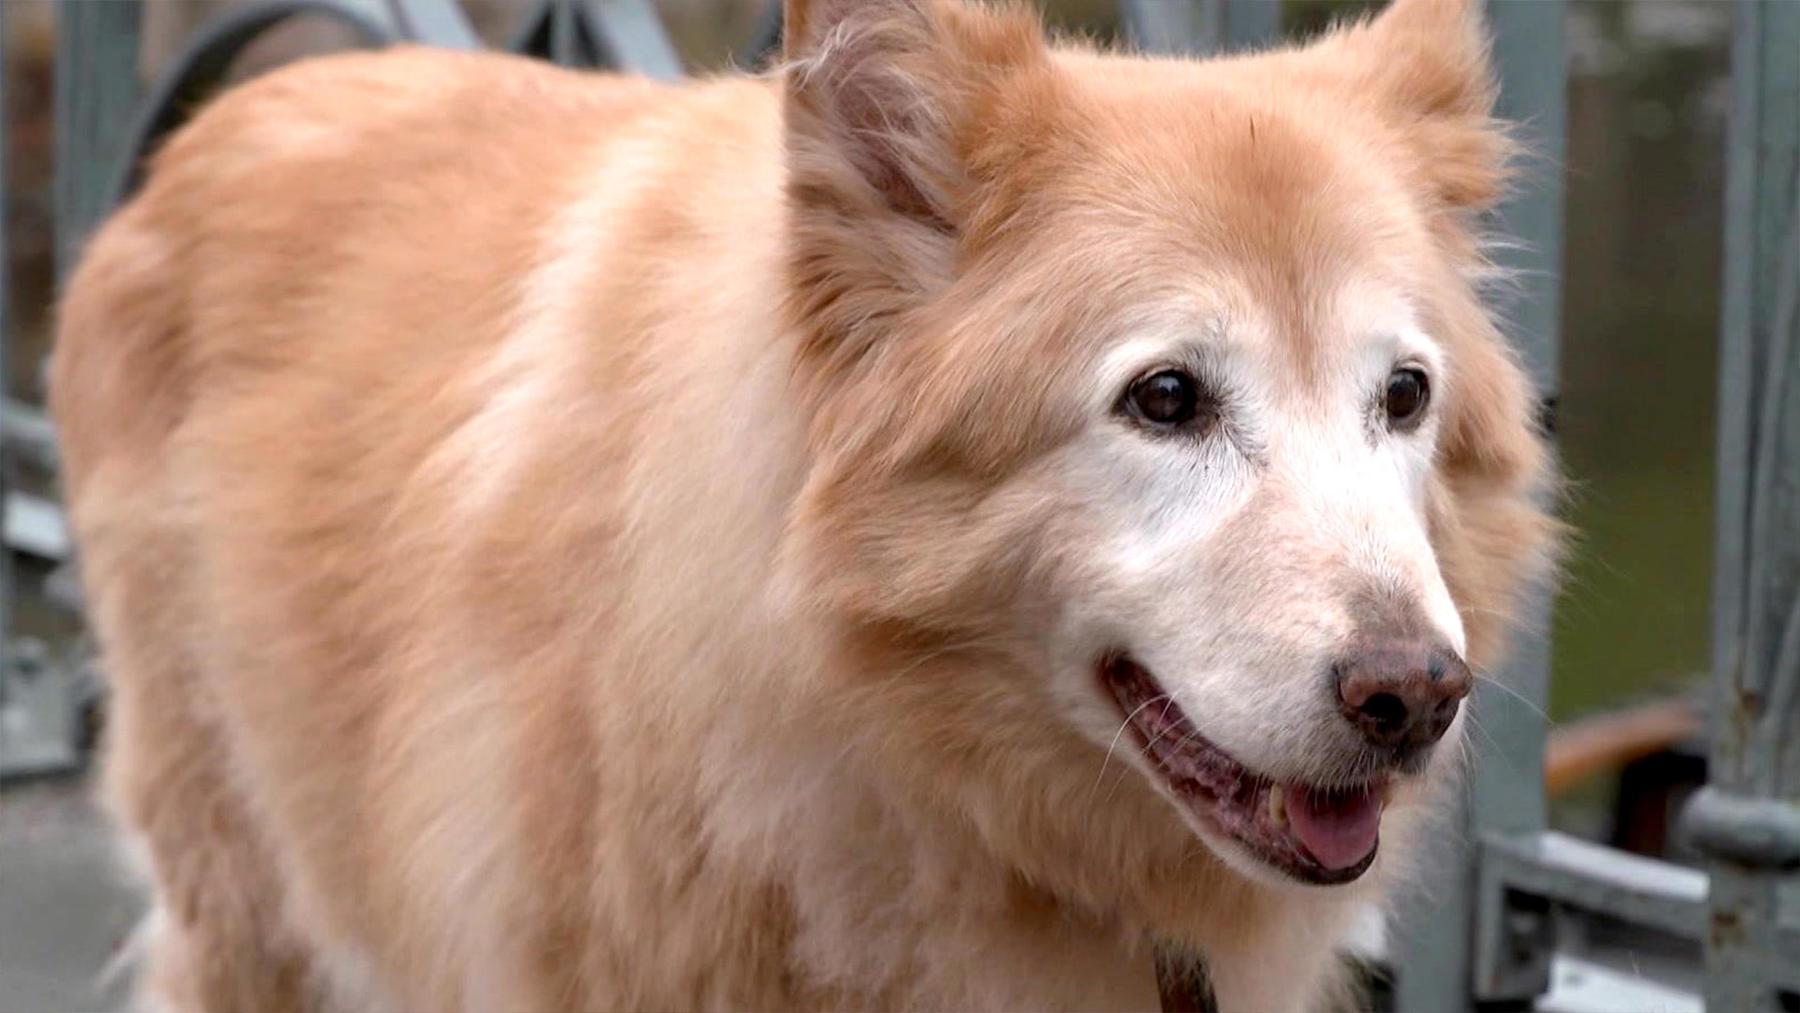 Thema u.a.: Hundegeruch